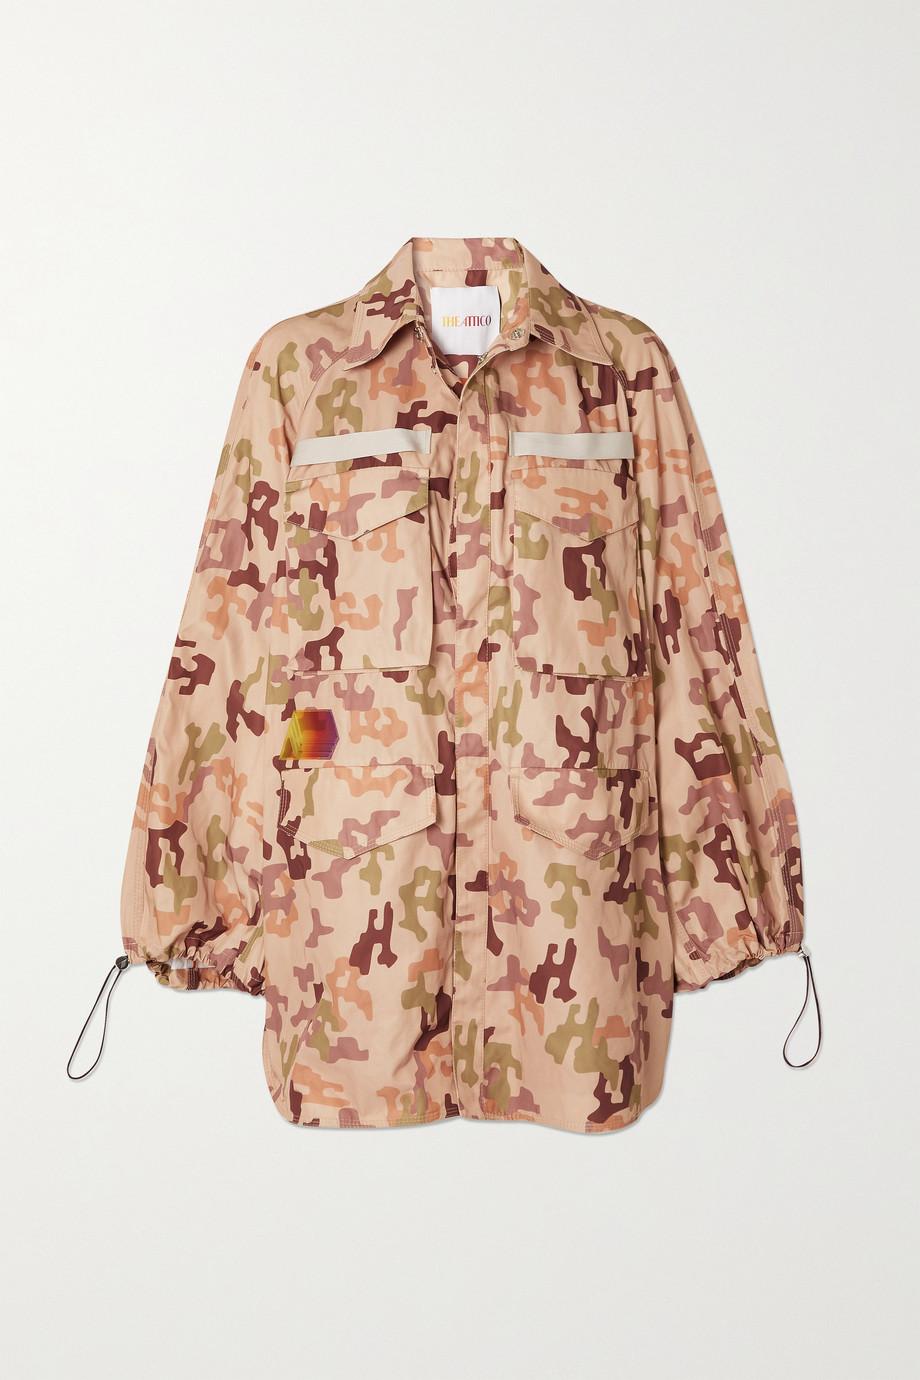 The Attico Dexter appliquéd camouflage-print twill jacket